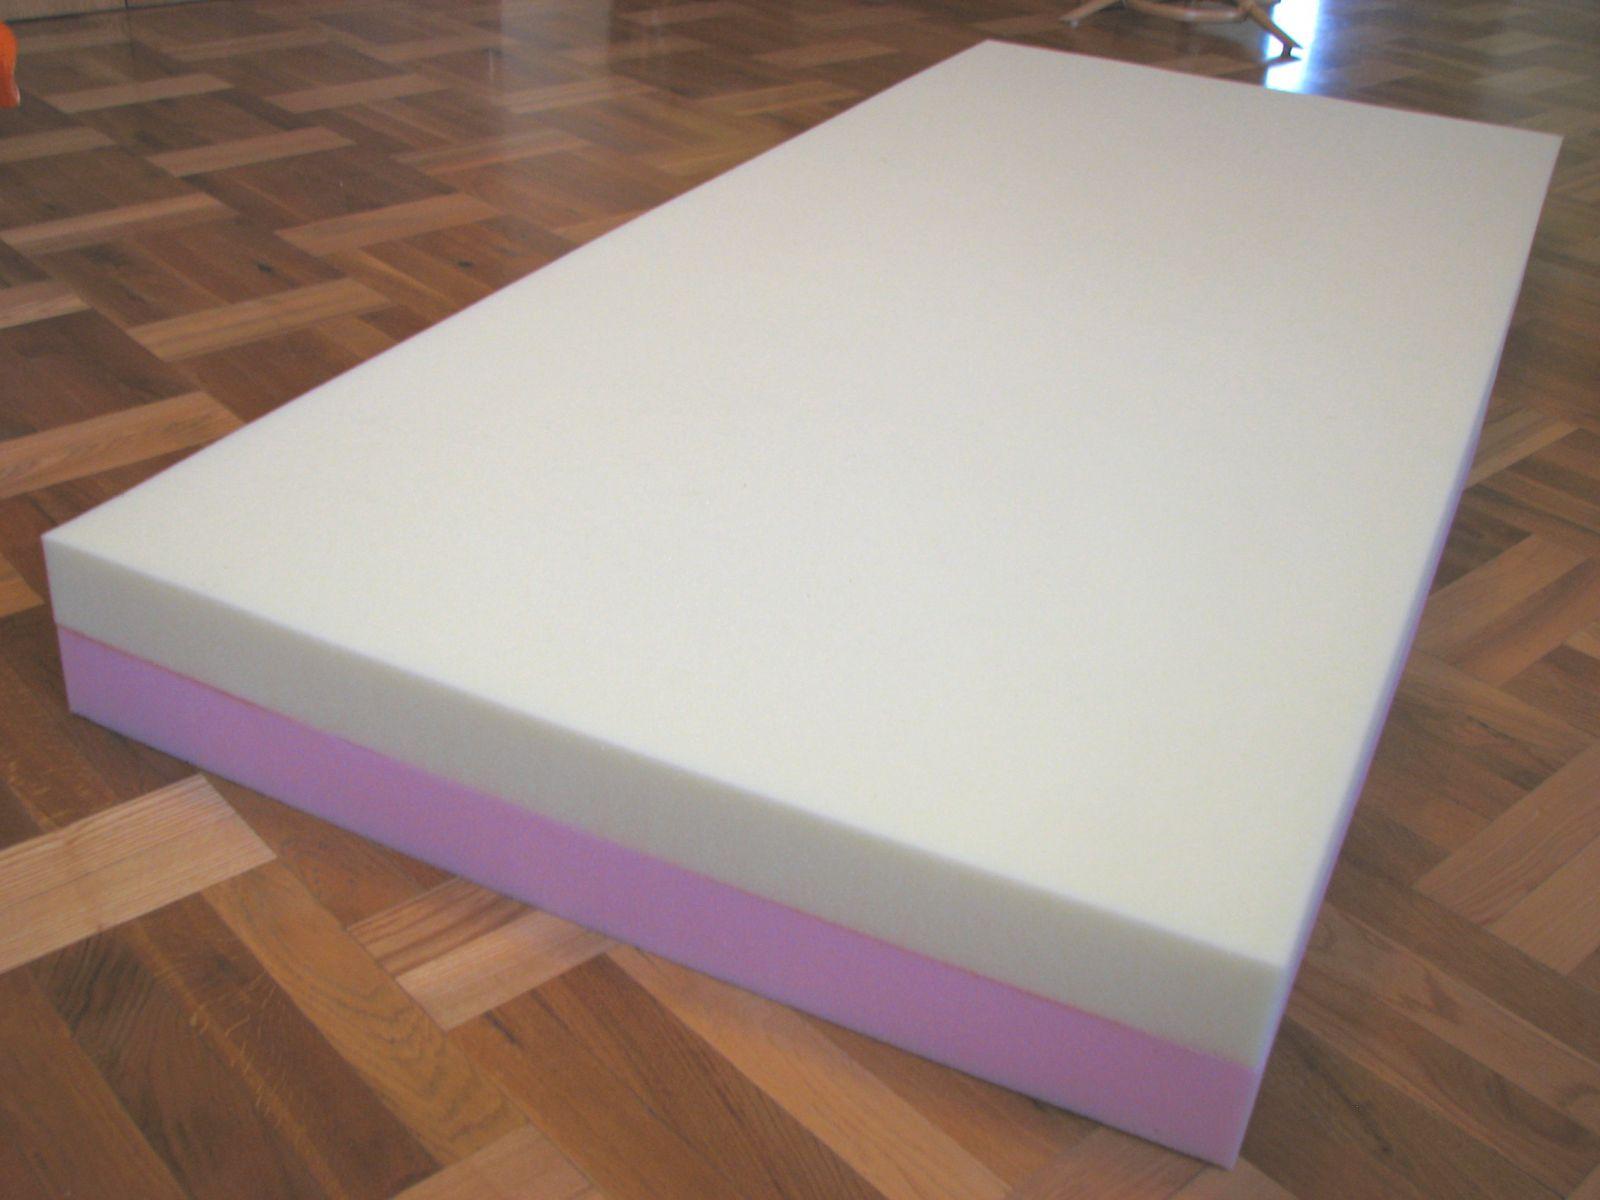 Matrace ze studené pěny DUO - I 200 x 100 x 17 Madona